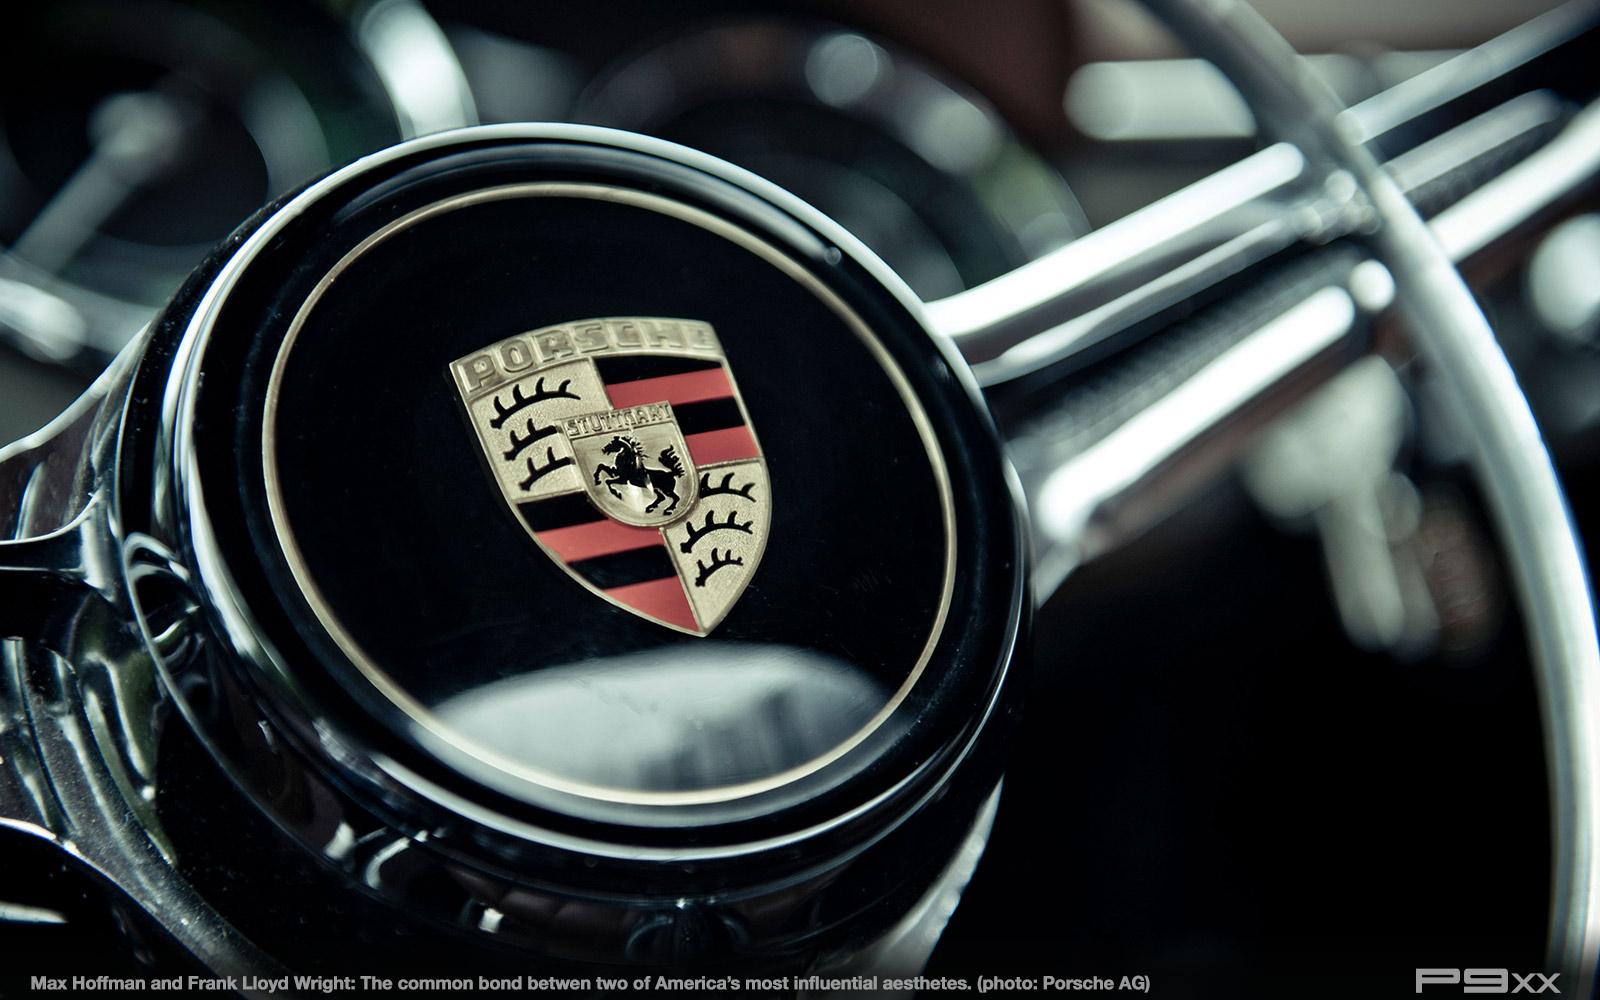 Max-Hoffman-Frank-Lloyd-Wright-Porsche-356-331